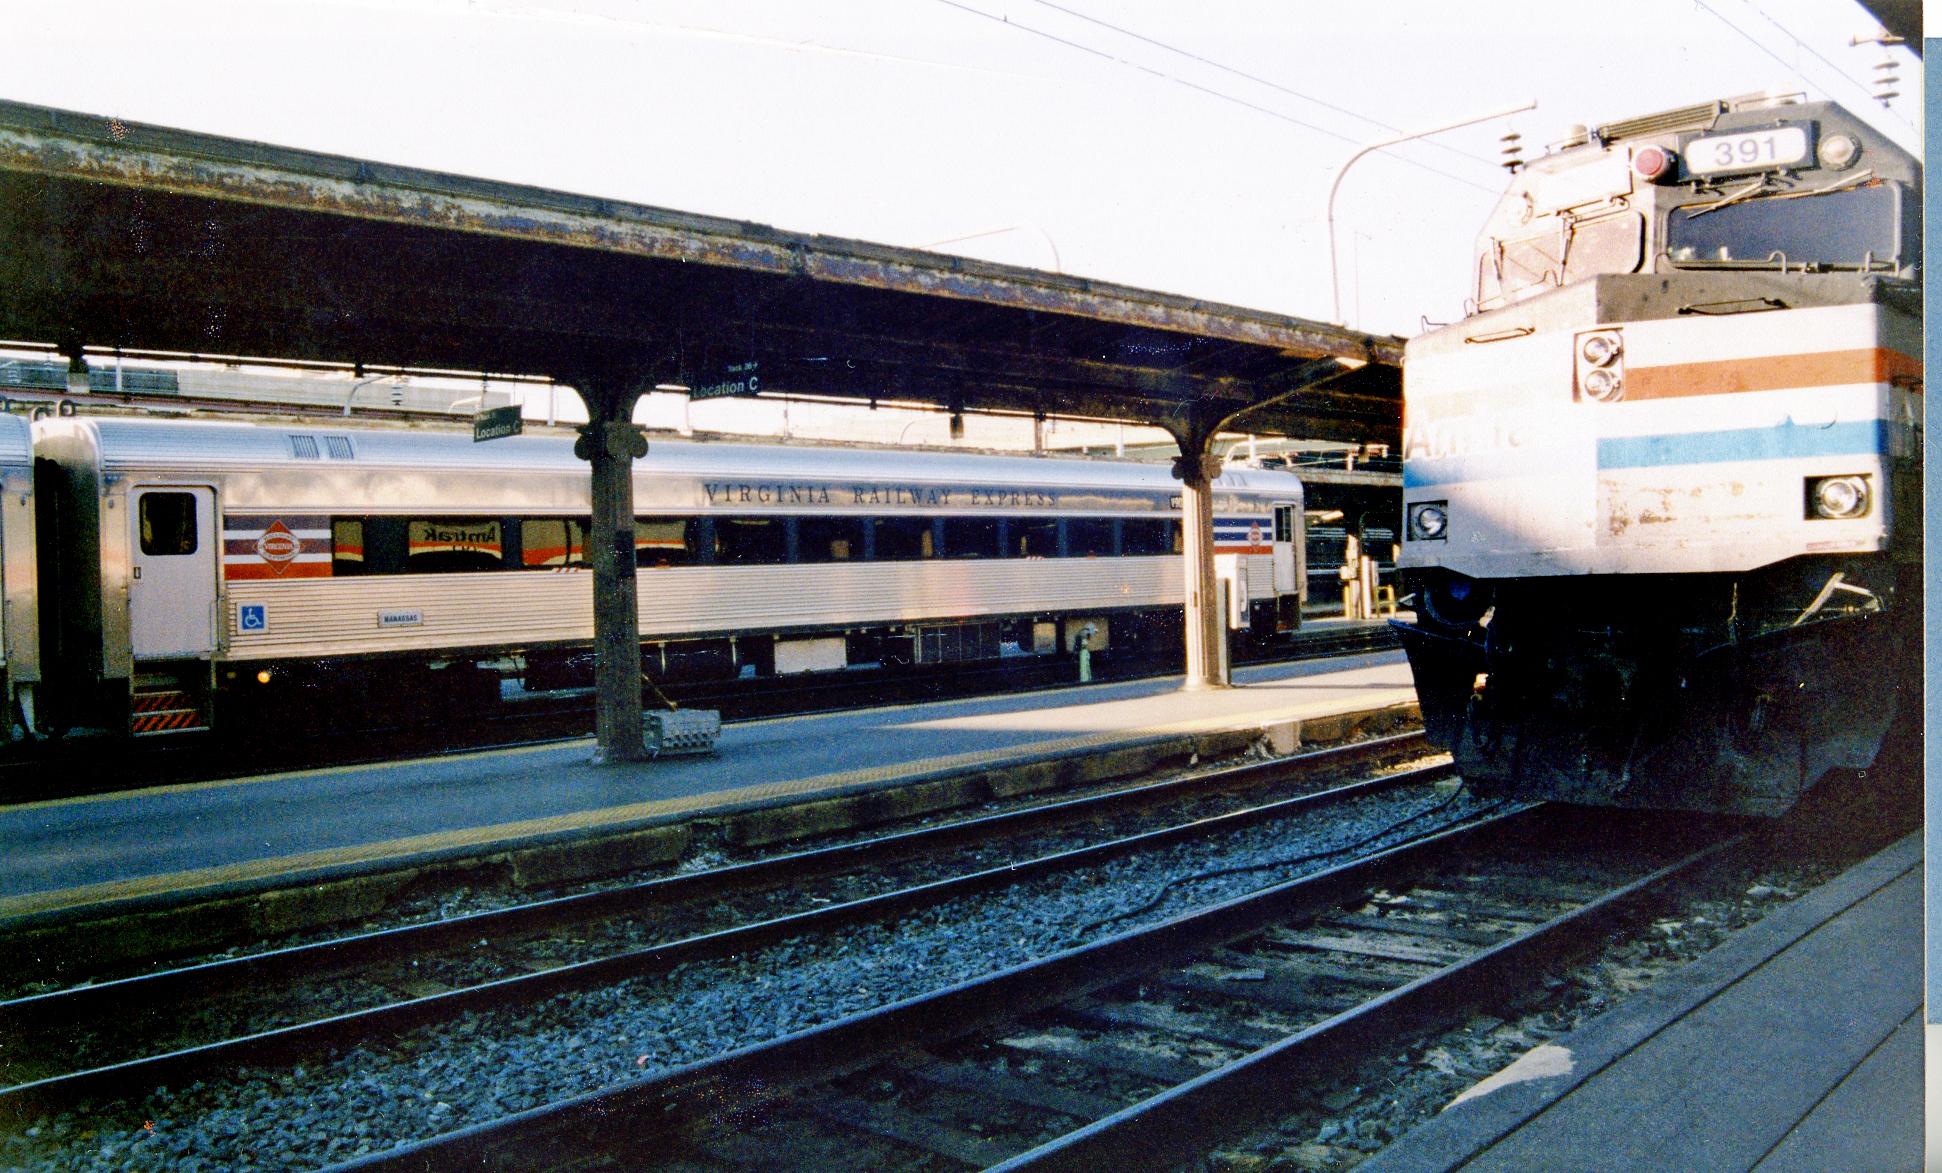 Amtrak From Washington Dc To Myrtle Beach Sc